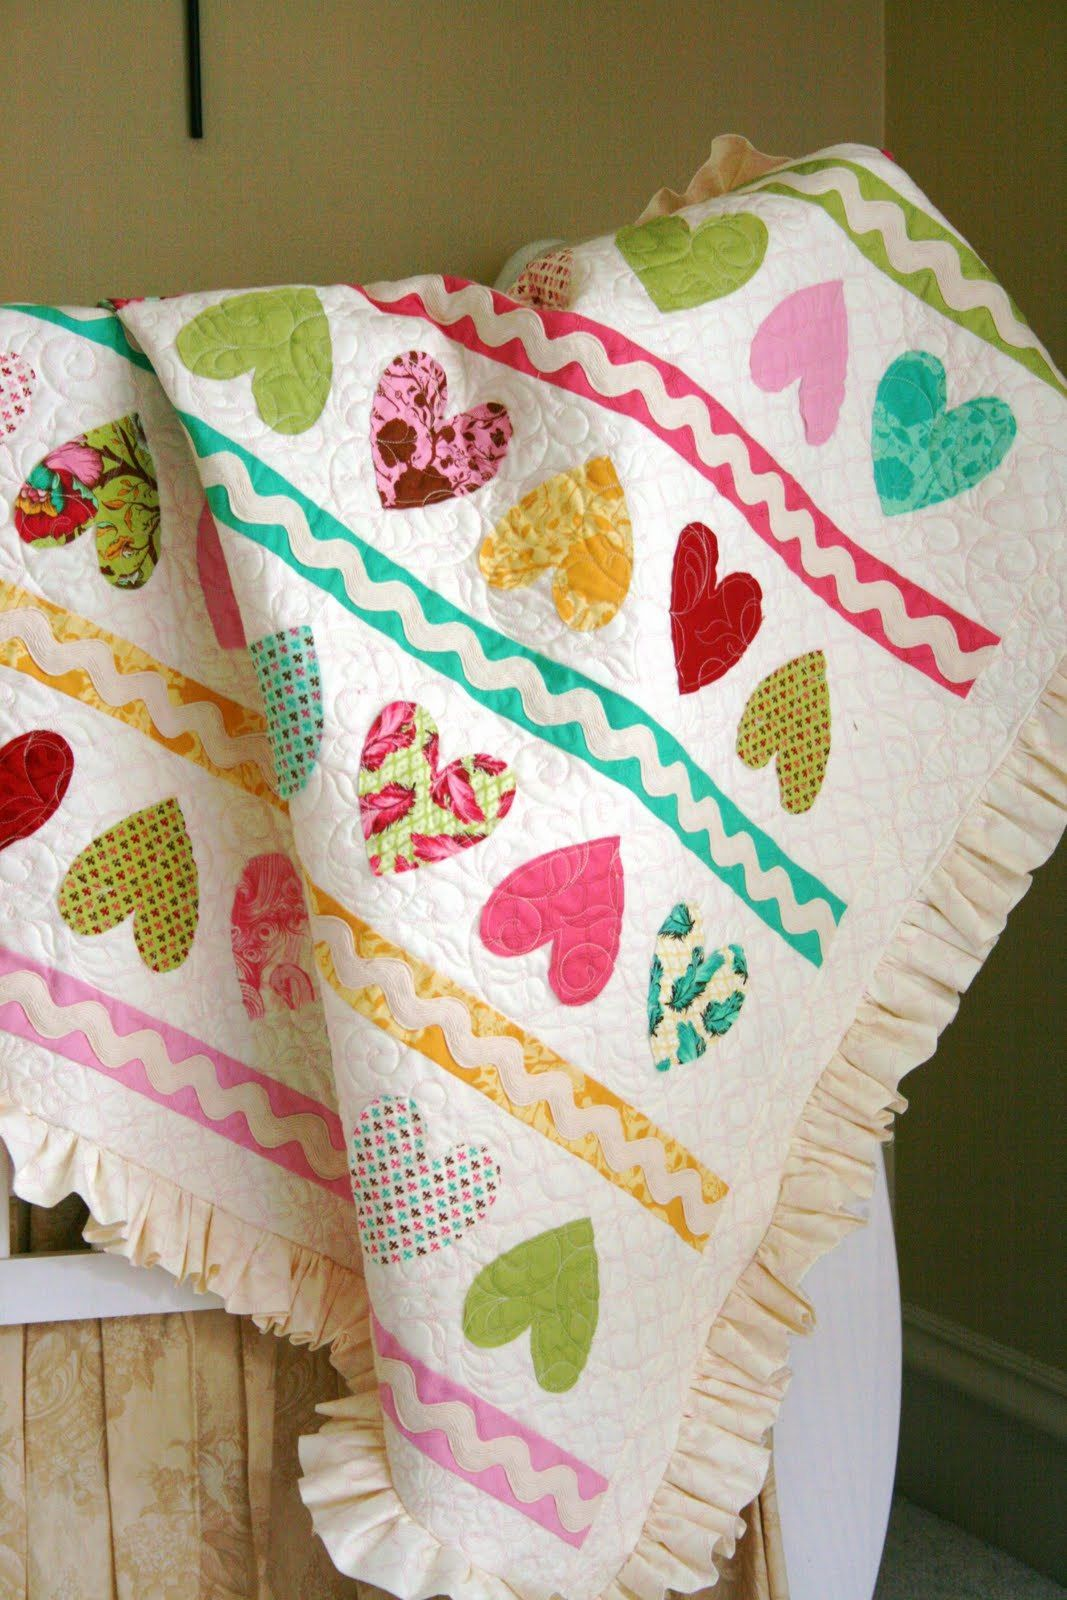 Candy Hearts Quilt Moda Bake Shop